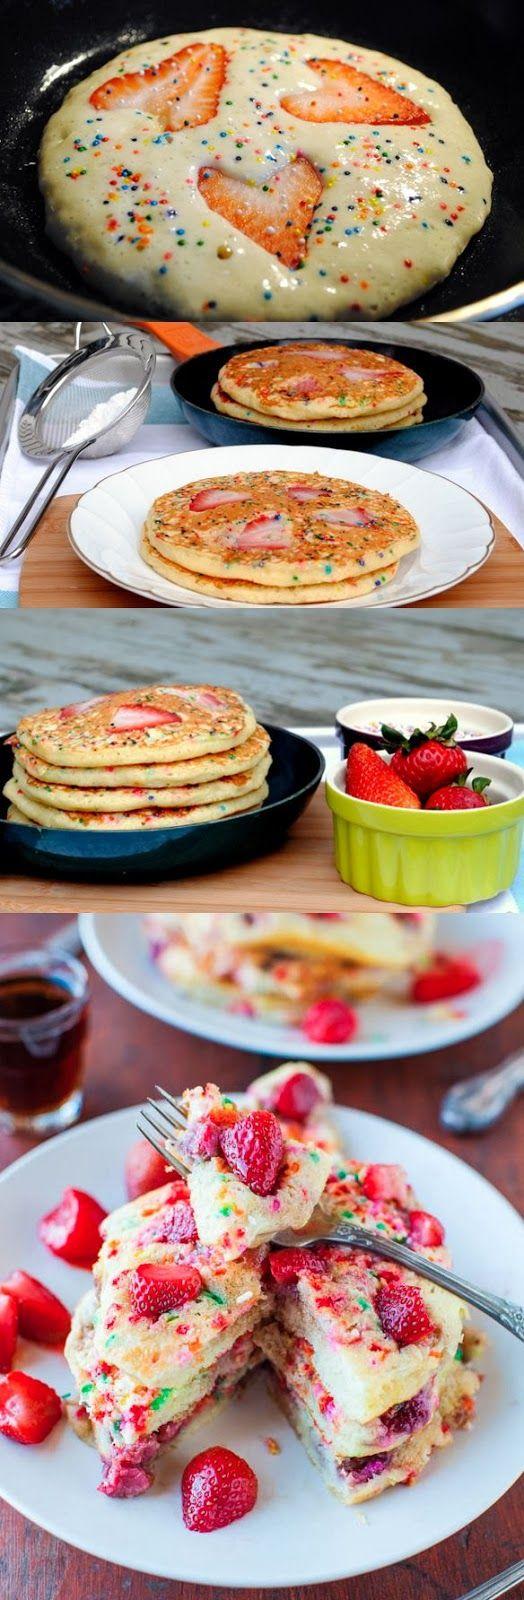 How To Strawberry Sprinkle Funfetti Pancakes